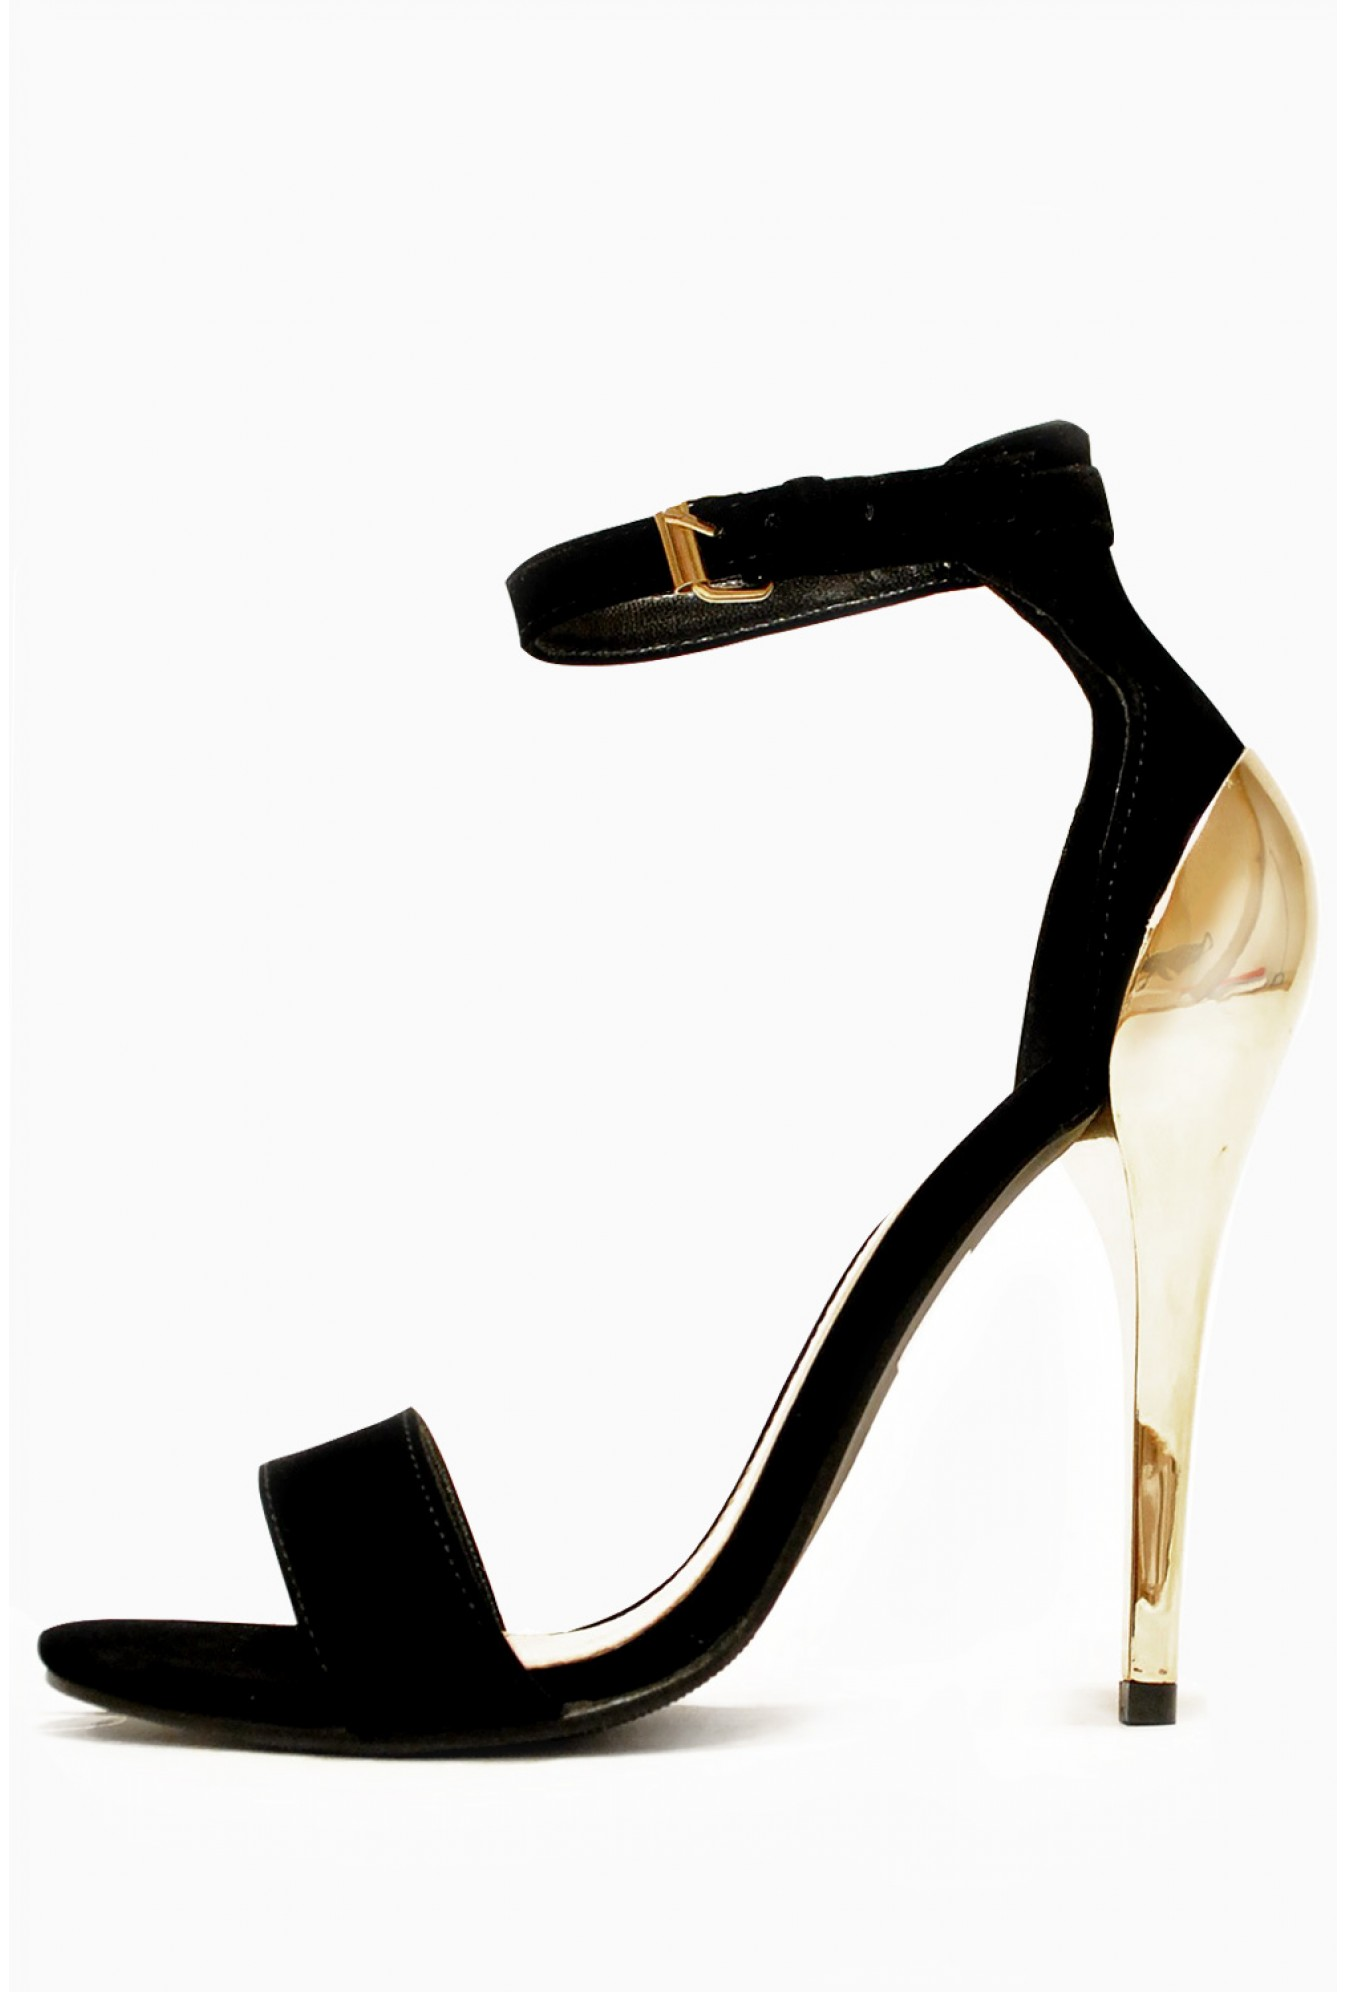 a3c4ef59183 More Views. Paula Strappy Metallic Mid Heels Sandals